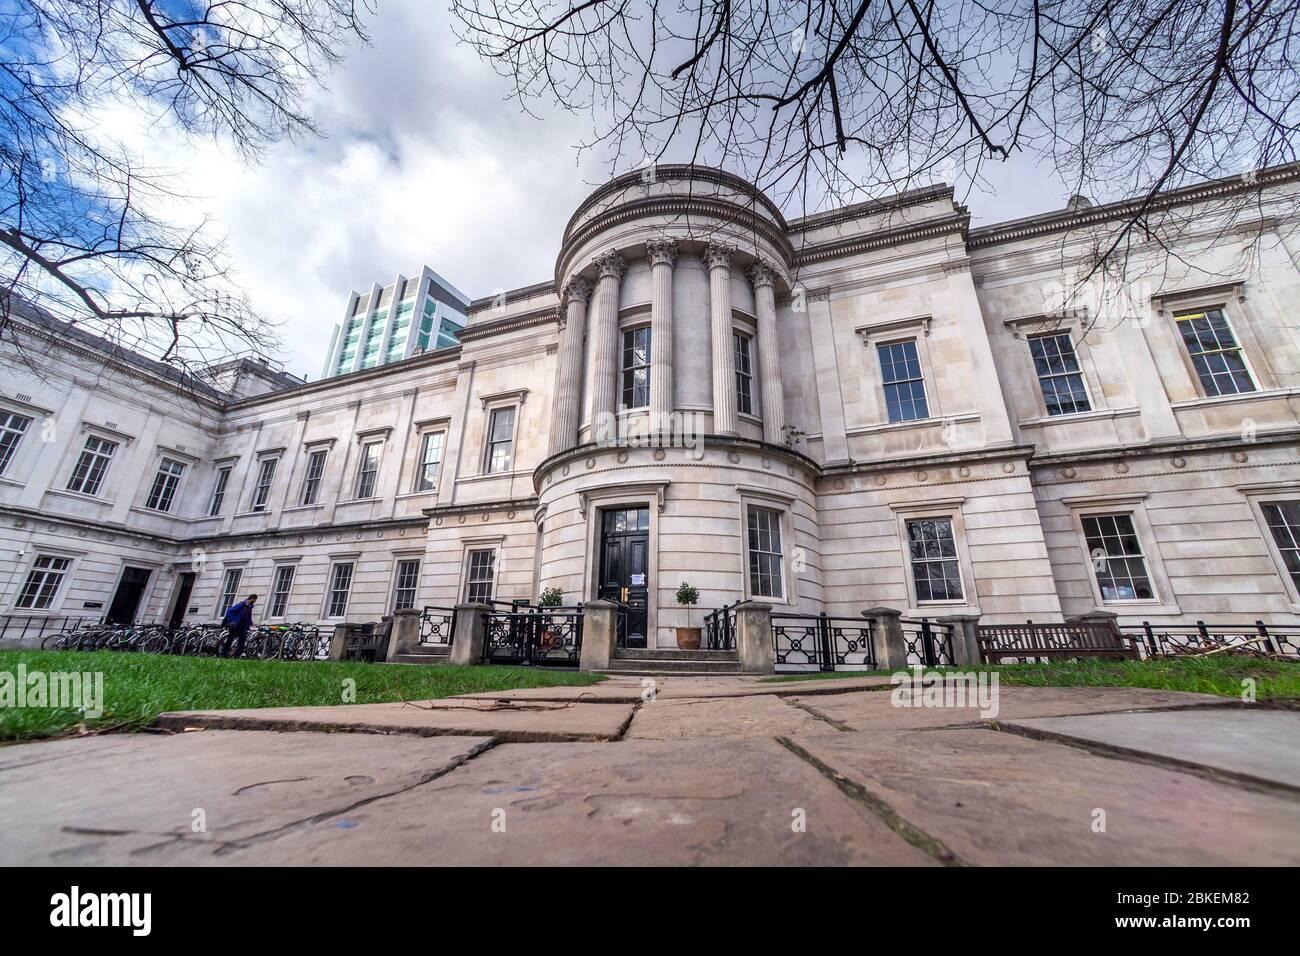 Slade School of Art, UCL University College London. North Wing, Gower Street, London. Stock Photo